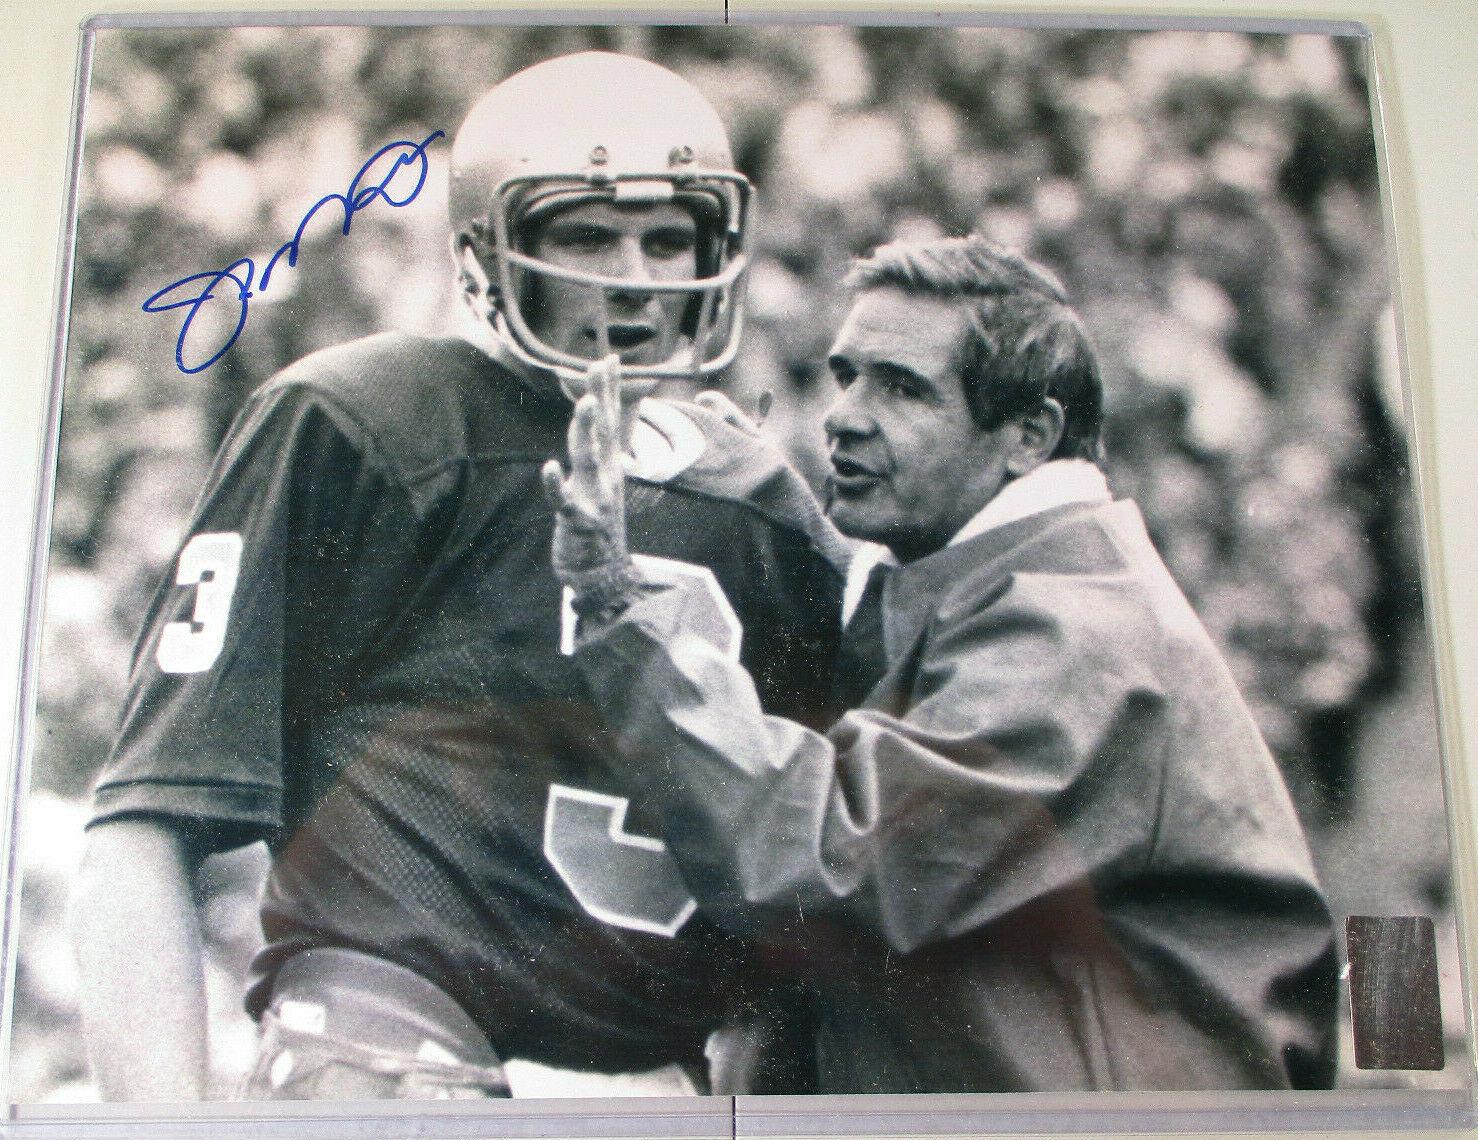 JOE MONTANA / NFL HALL OF FAME / AUTOGRAPHED 8X10 GAME ACTION PHOTO / PLAYER COA